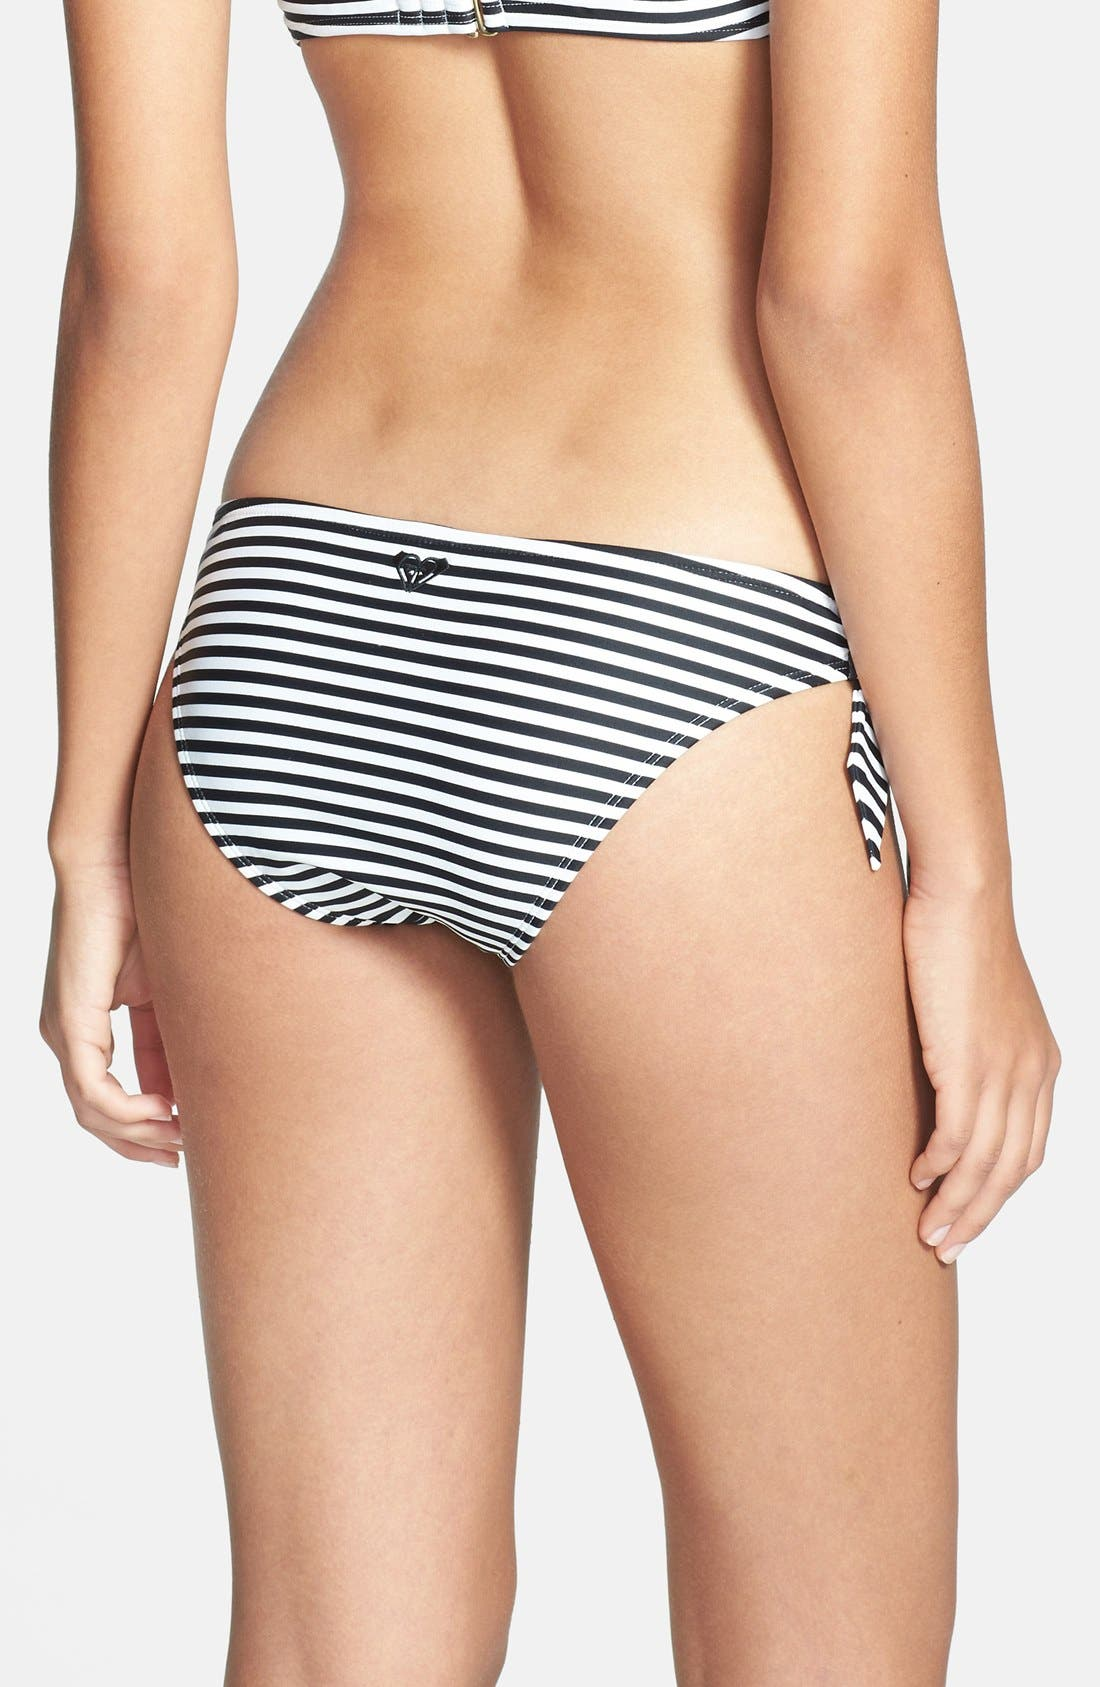 Alternate Image 2  - Roxy 'Sunset Stripes' Side Tie Low-Rise Bikini Bottoms